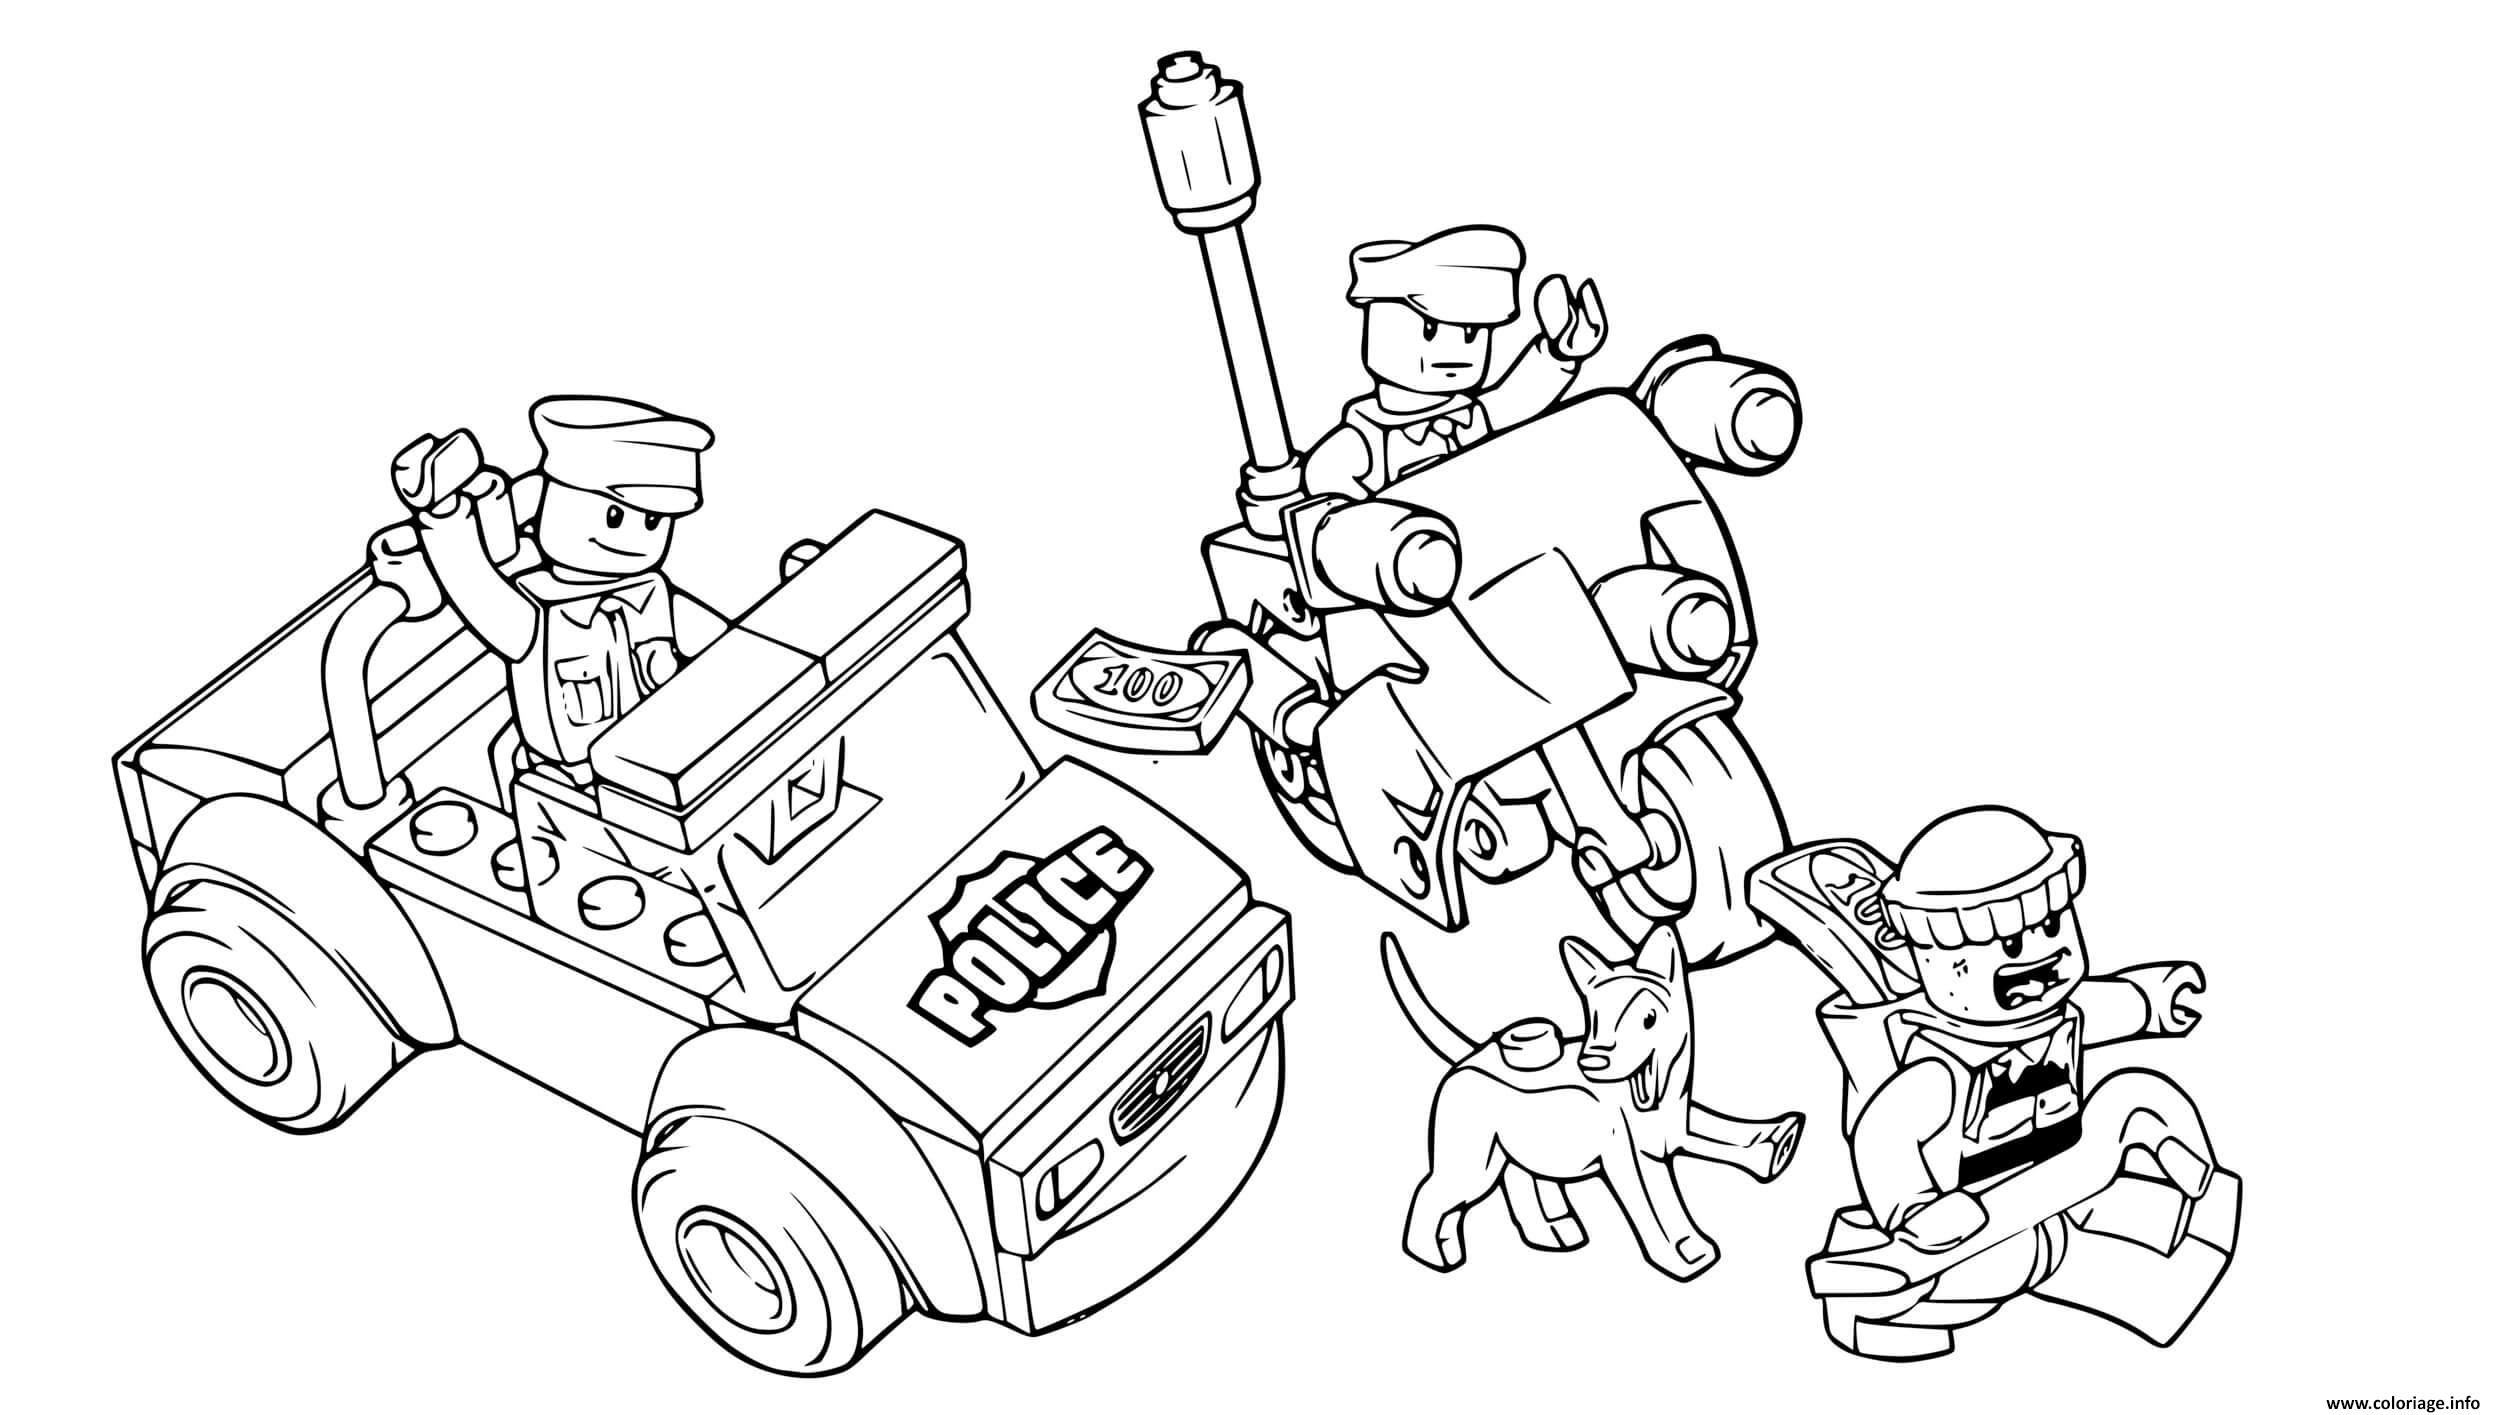 Coloriage Police Lego Moto Voiture 4x4 Chien Policier Jecolorie Com